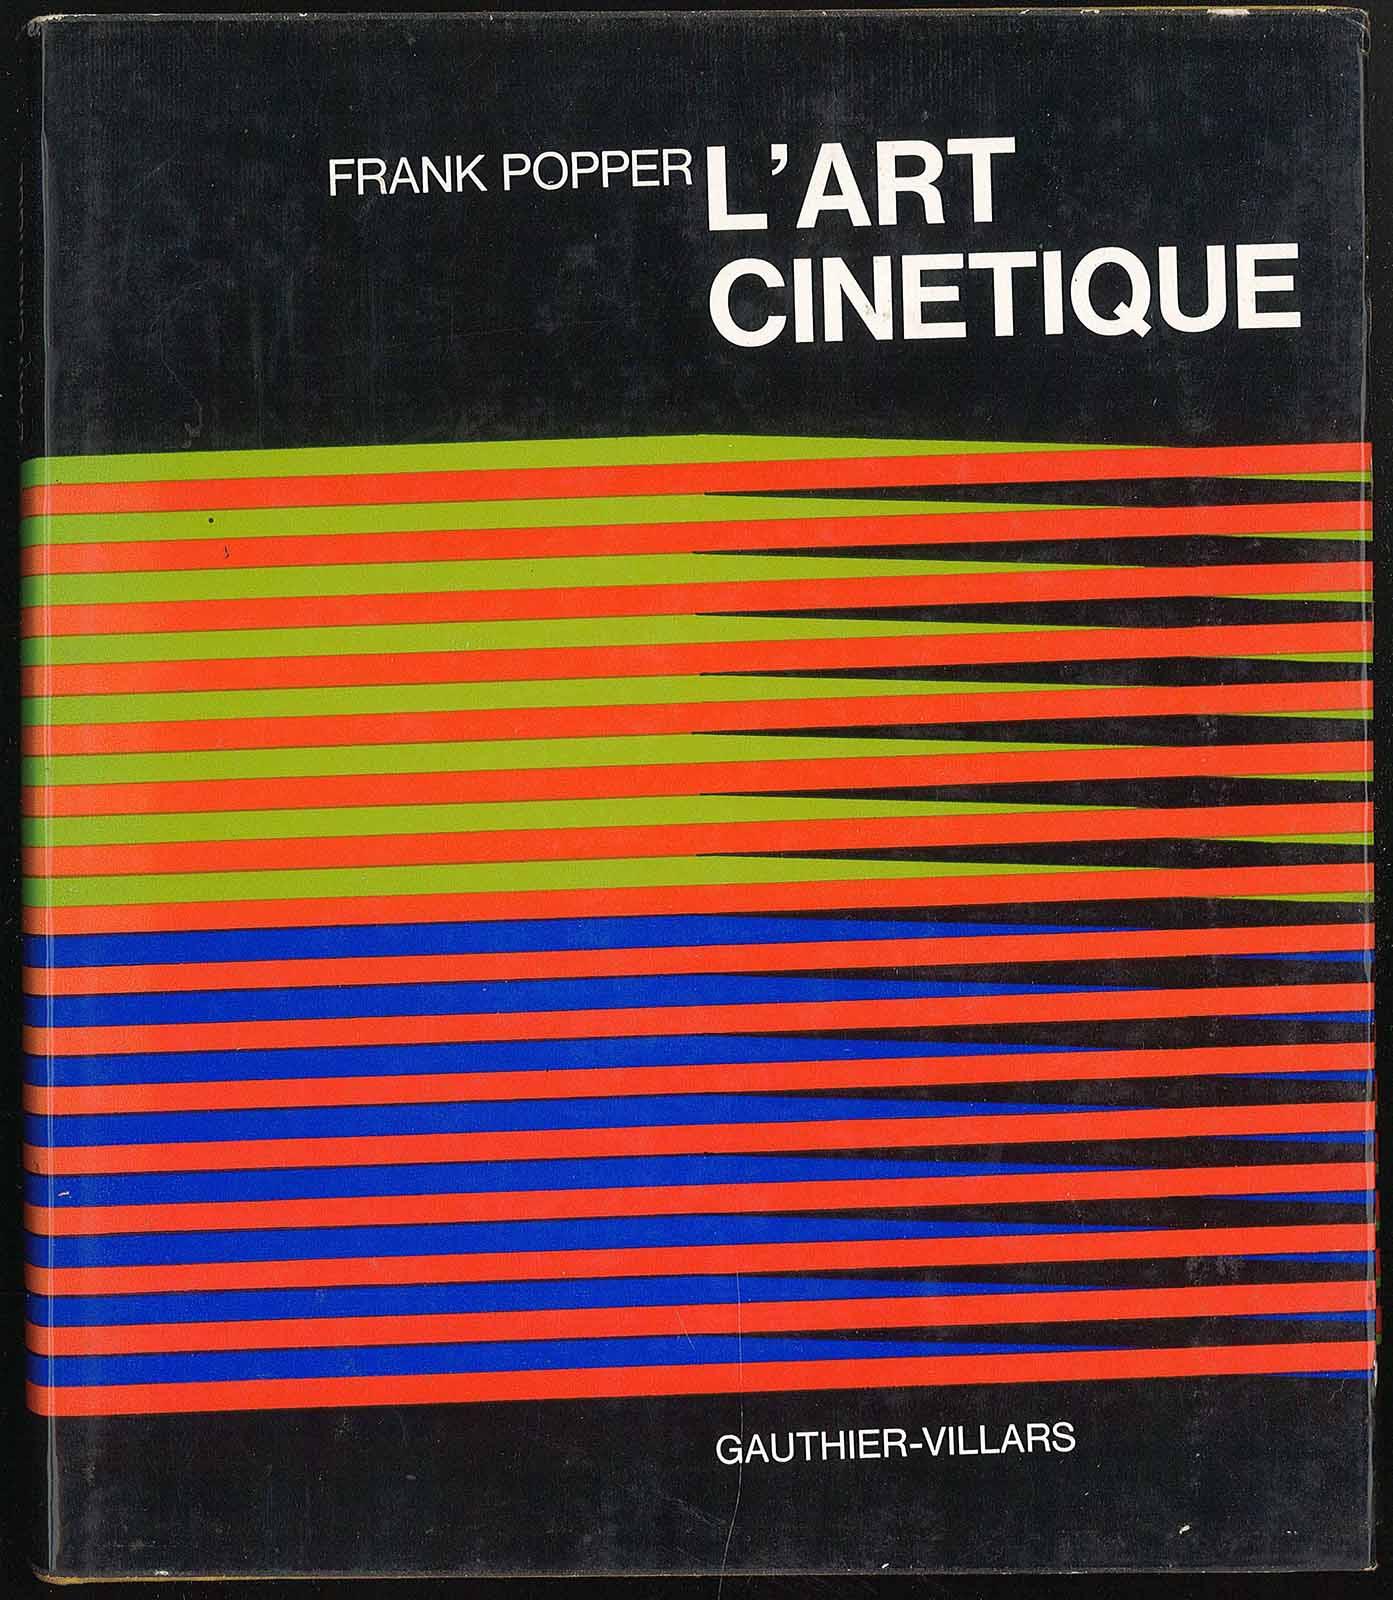 L'art cinetique: Popper Frank